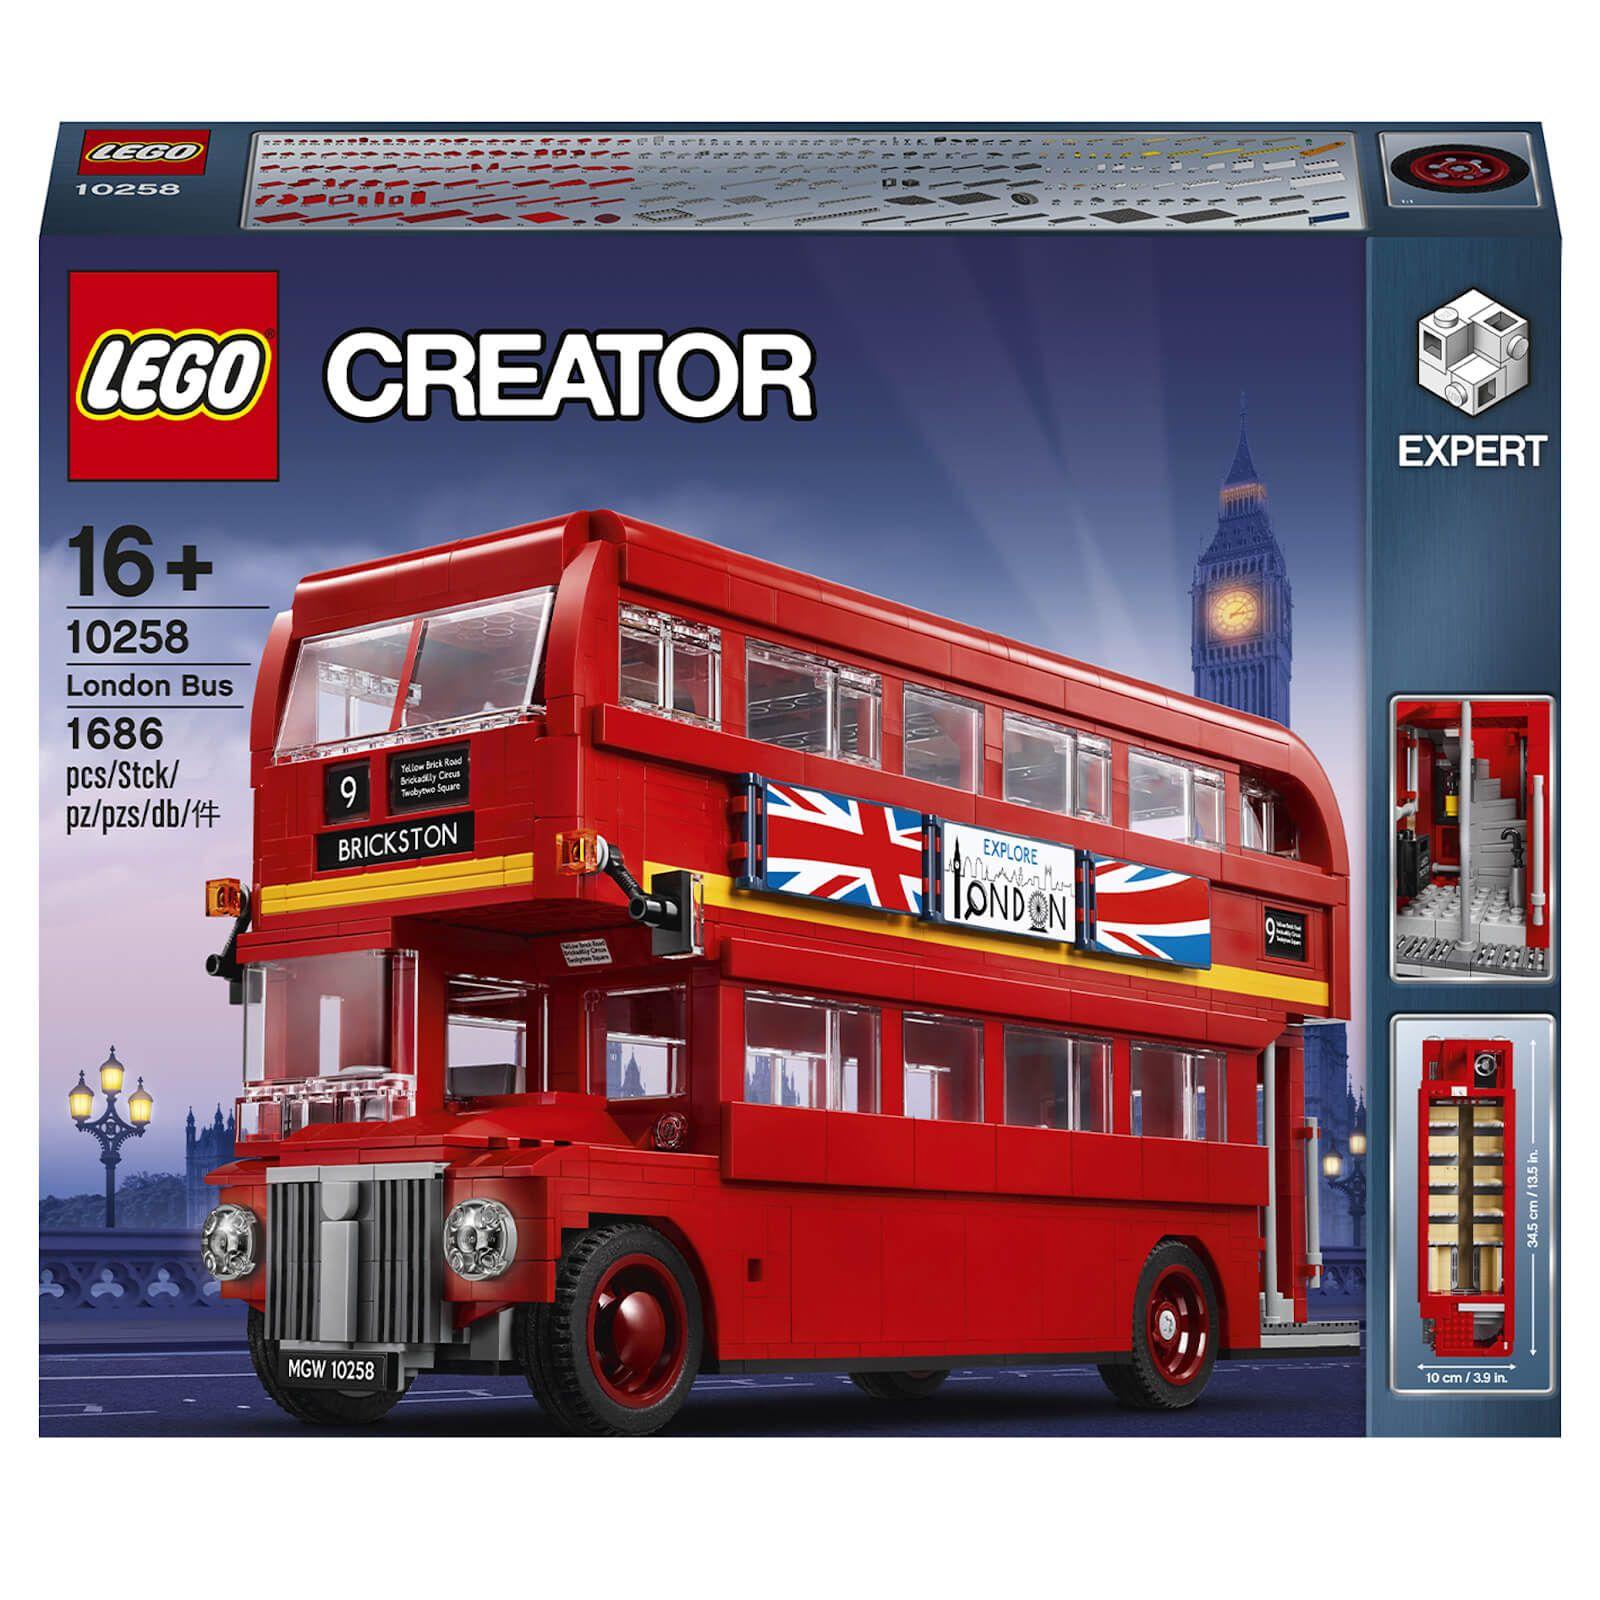 Jouet Lego Creator Expert: Le bus londonien (10258)